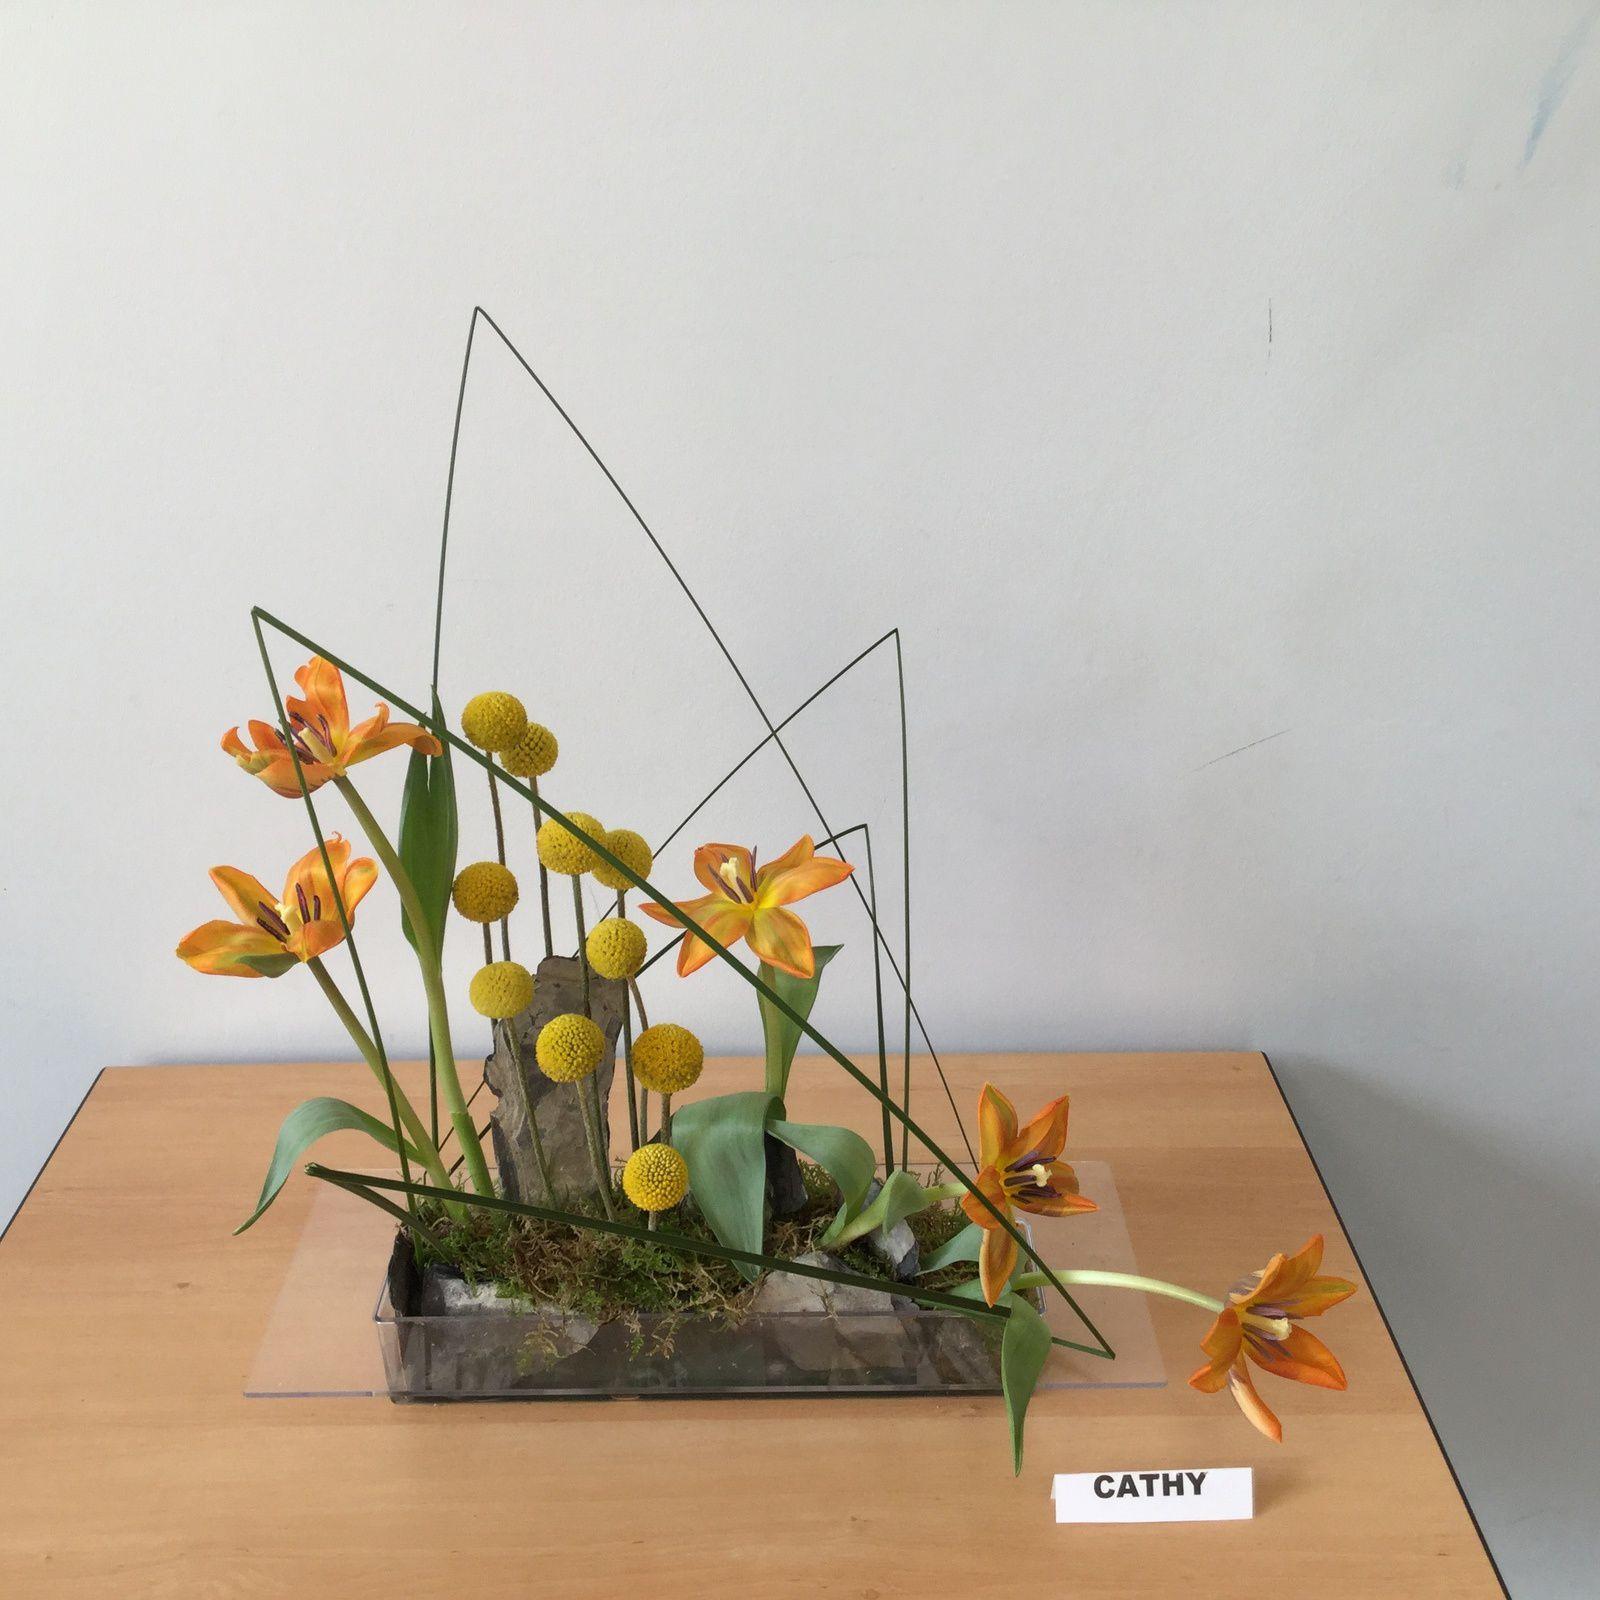 Craspedia, Steel -grass, Tulipes, Mousse des bois, Ardoise